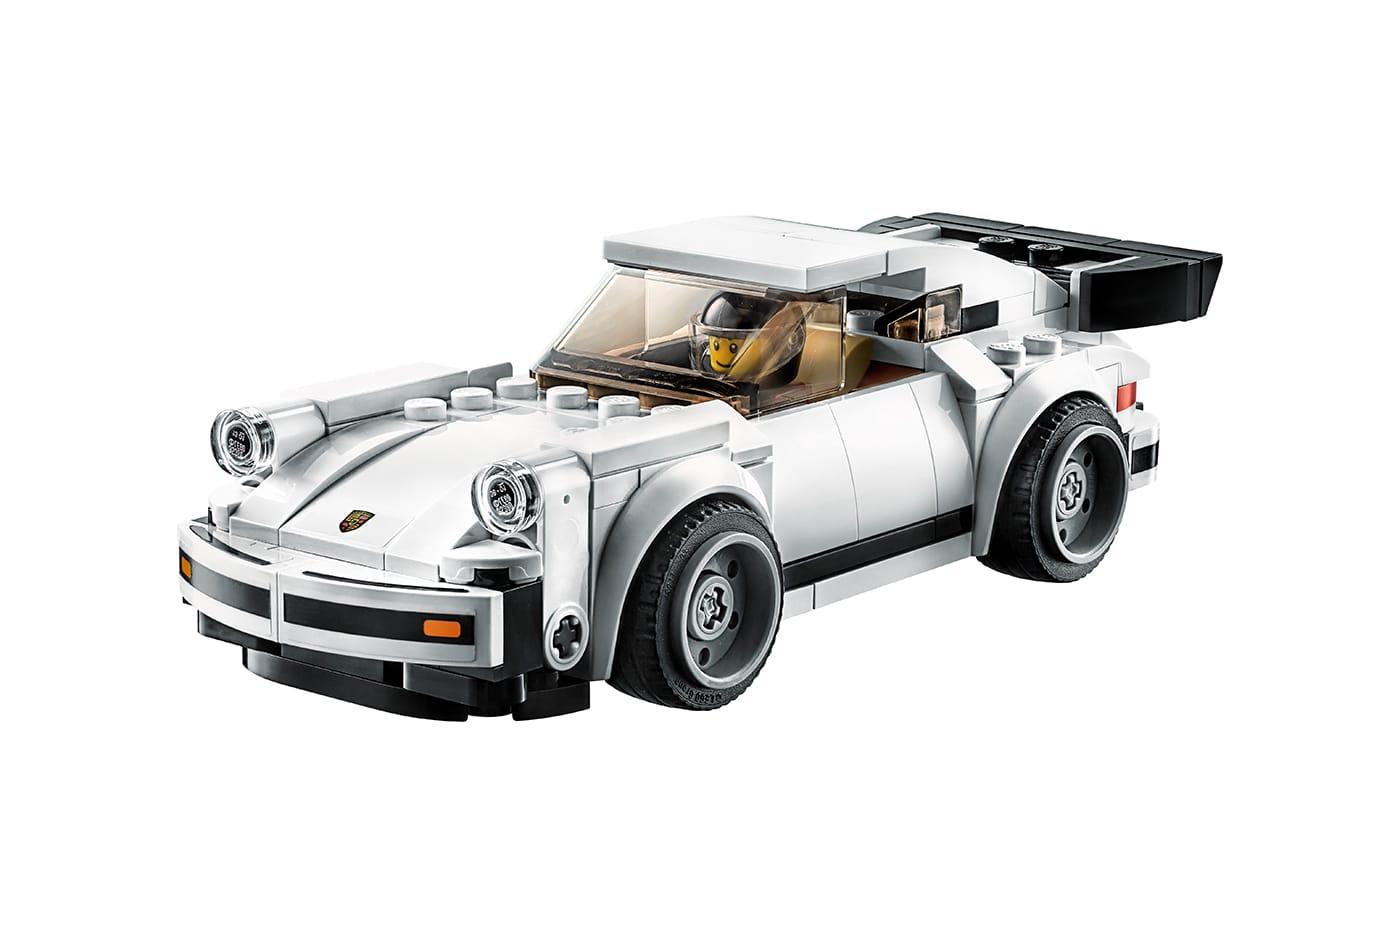 LEGO 1974 Porsche 911 Turbo 3.0 Release